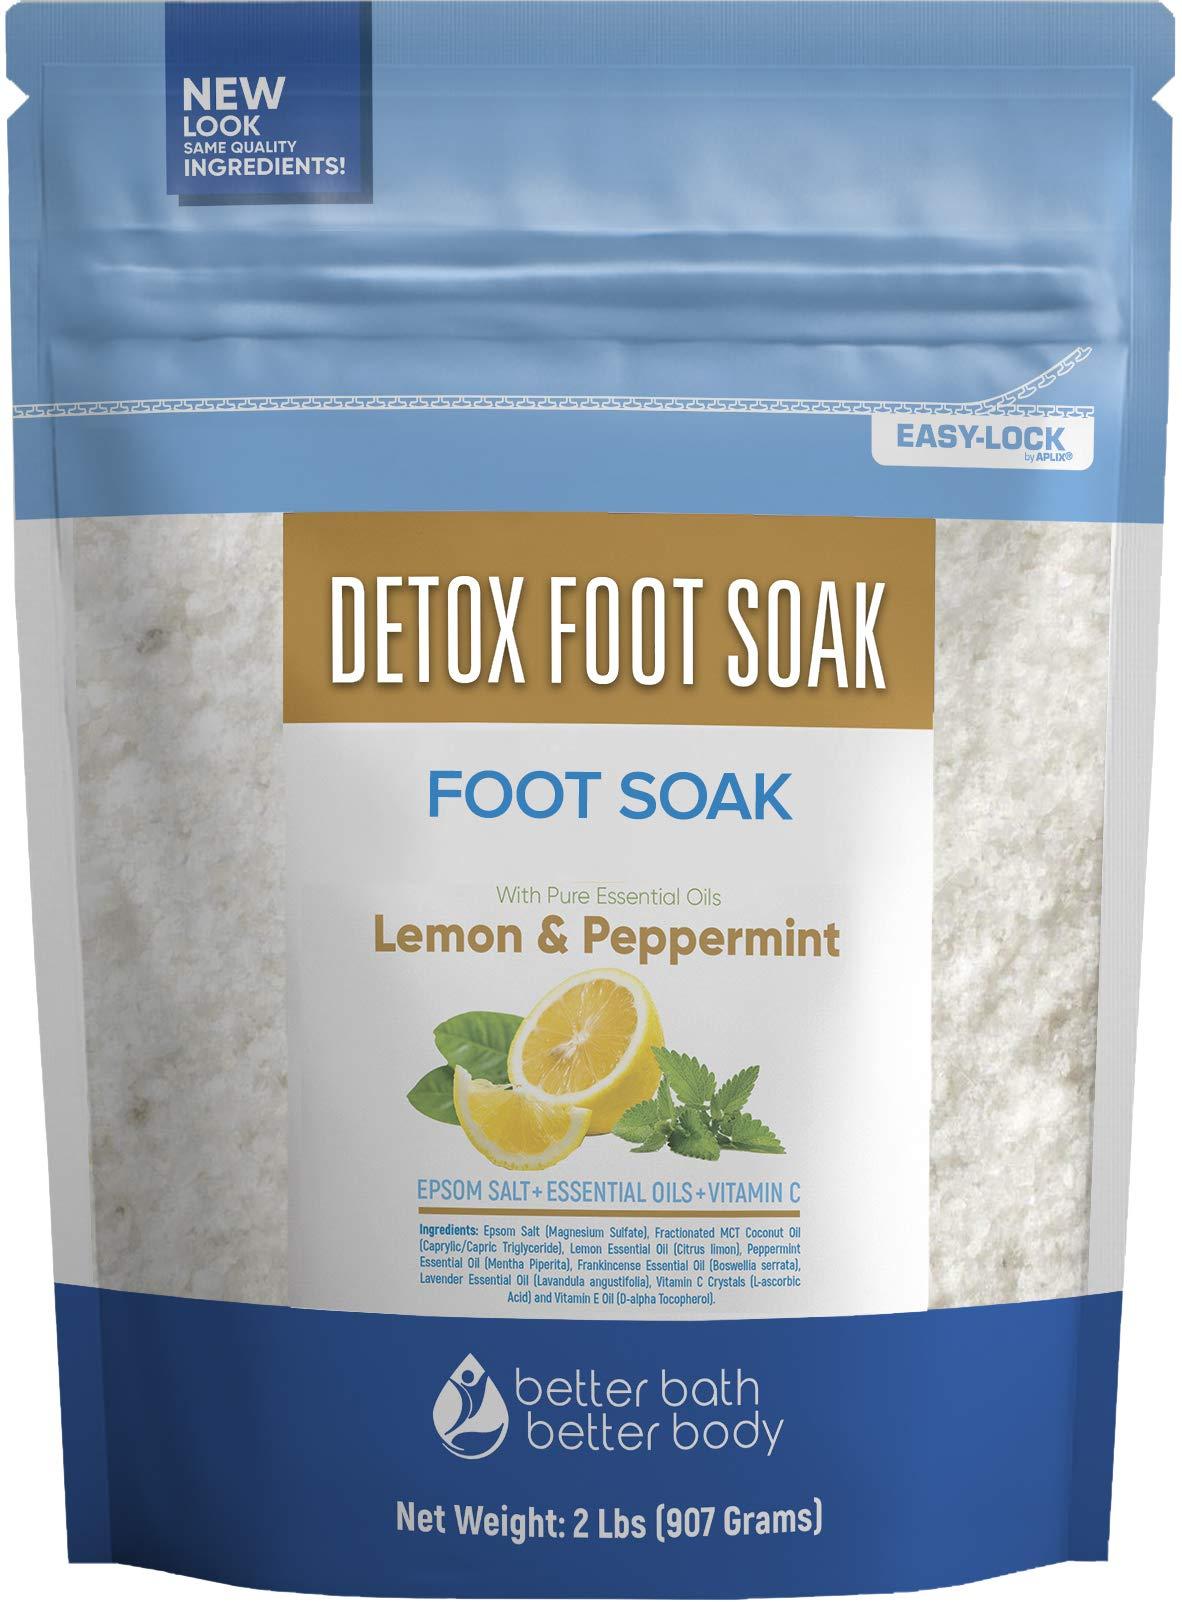 Detox Foot Soak 32 Ounces Epsom Salt